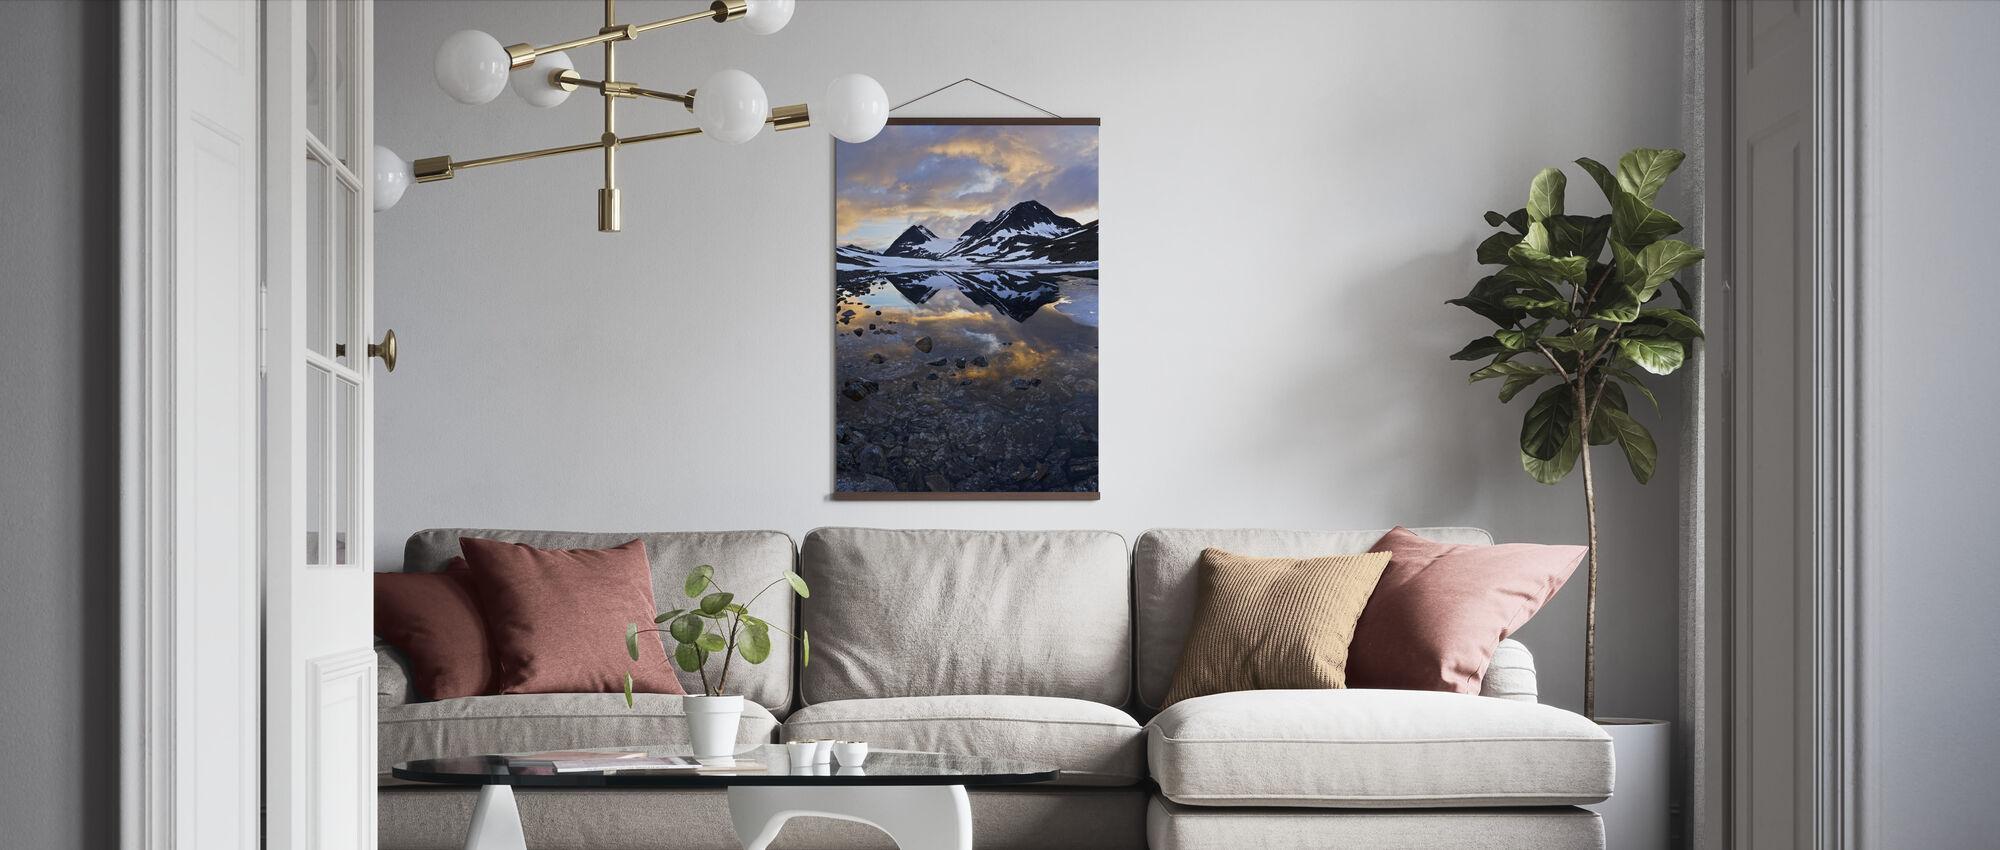 Nallojaure Landscape, Sweden - Poster - Woonkamer